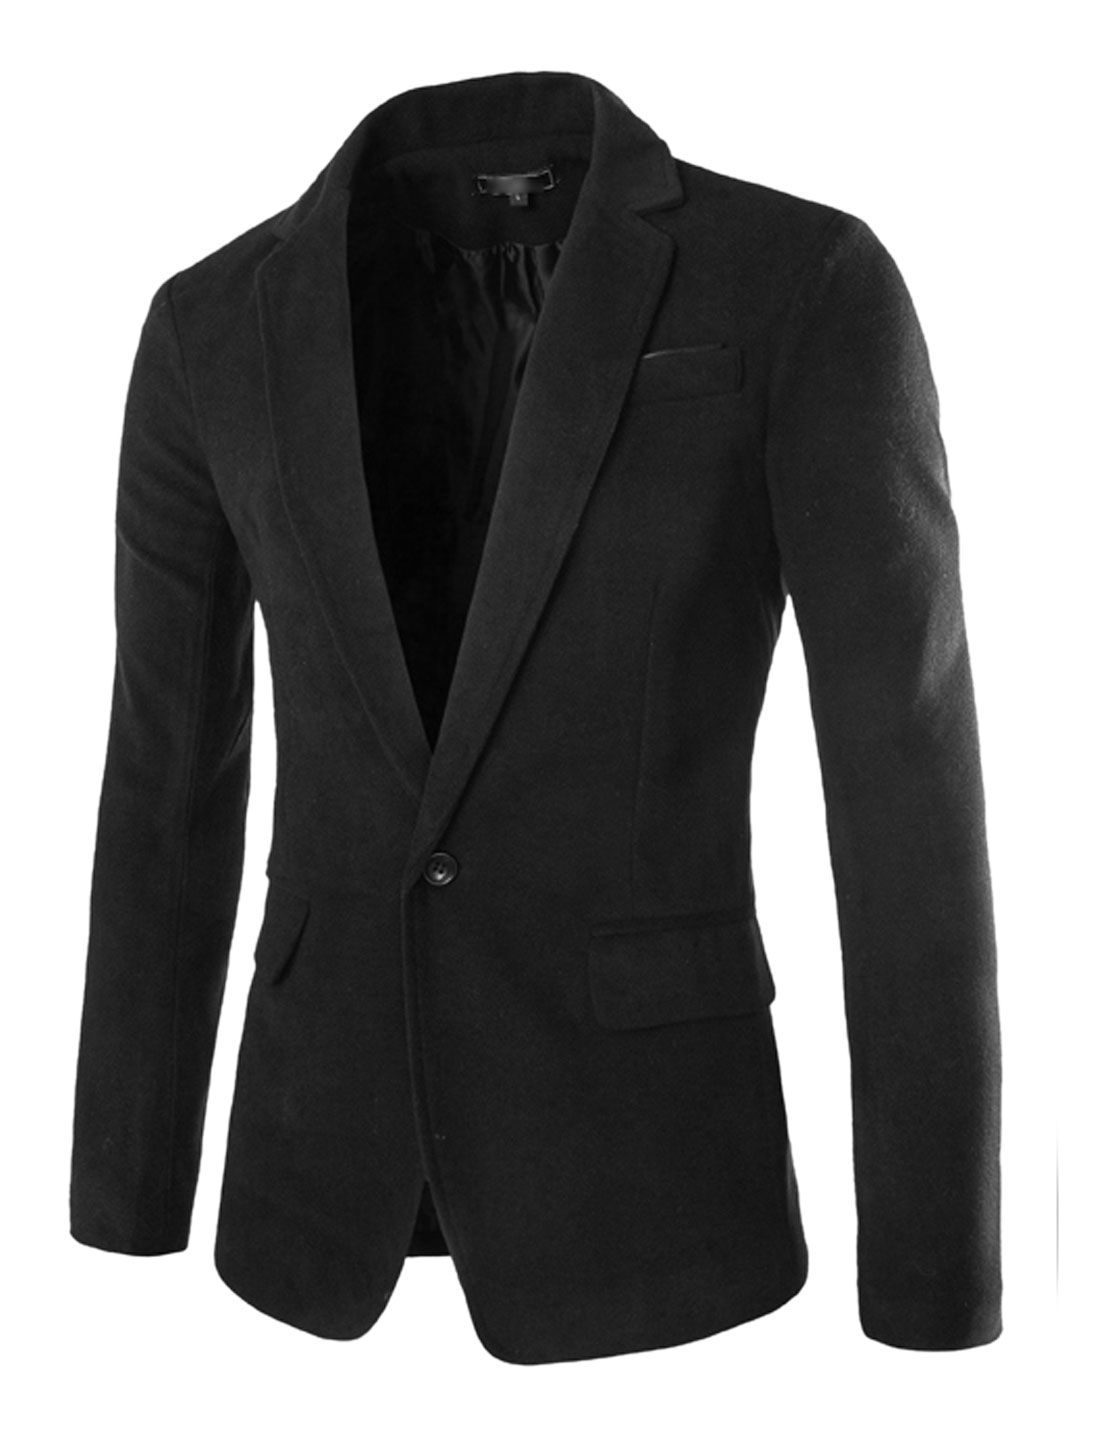 Men Long Sleeve Notched Lapel One Button Closure Blazer Jacket Black M